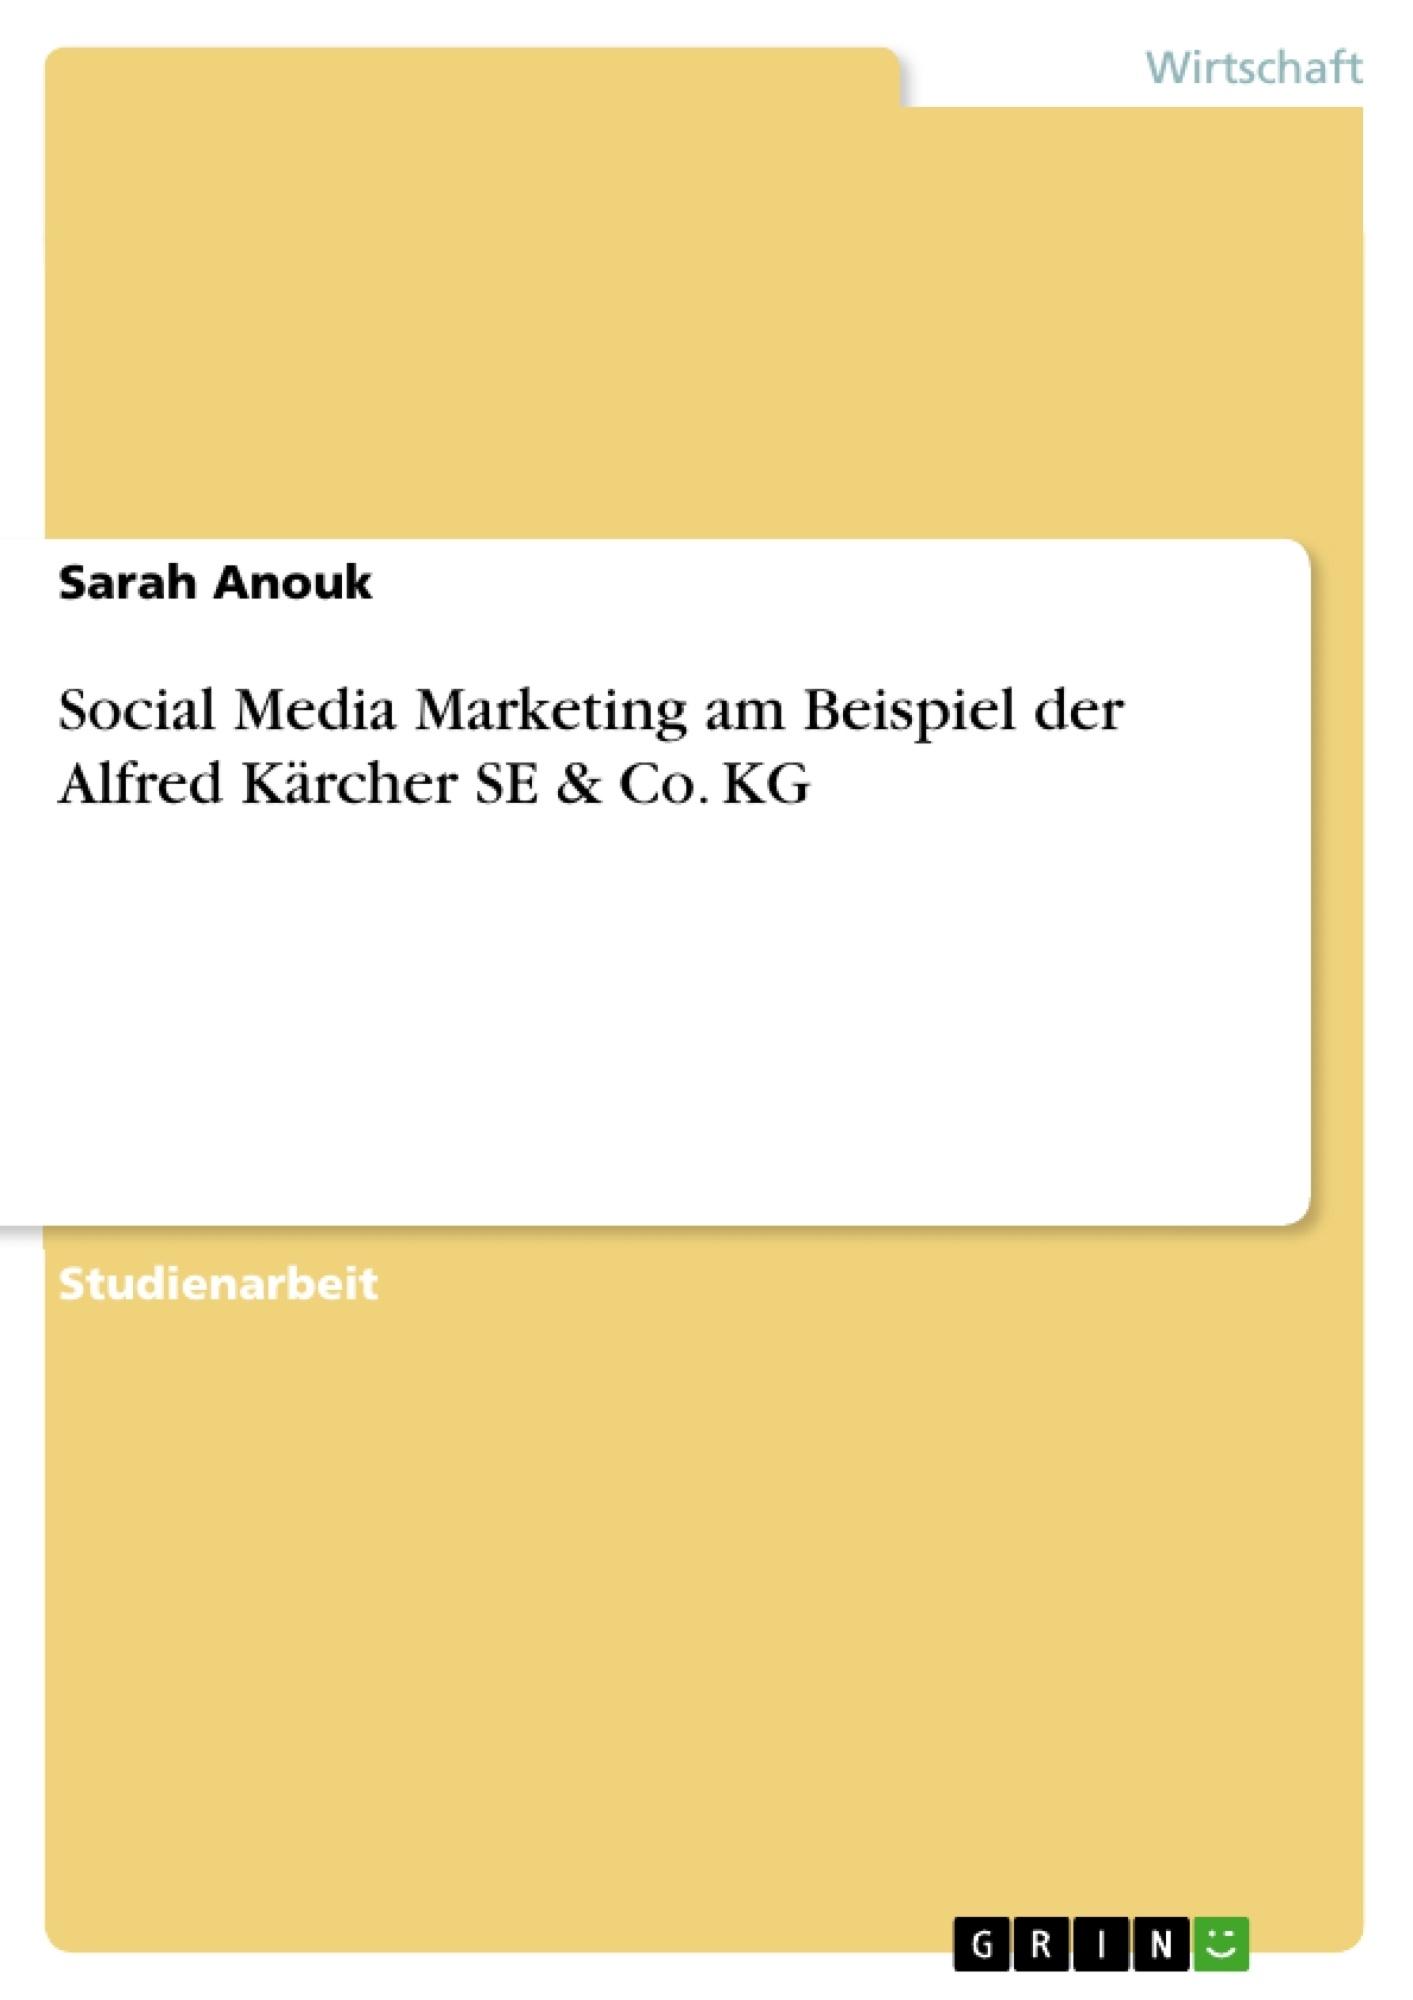 Titel: Social Media Marketing am Beispiel der Alfred Kärcher SE & Co. KG